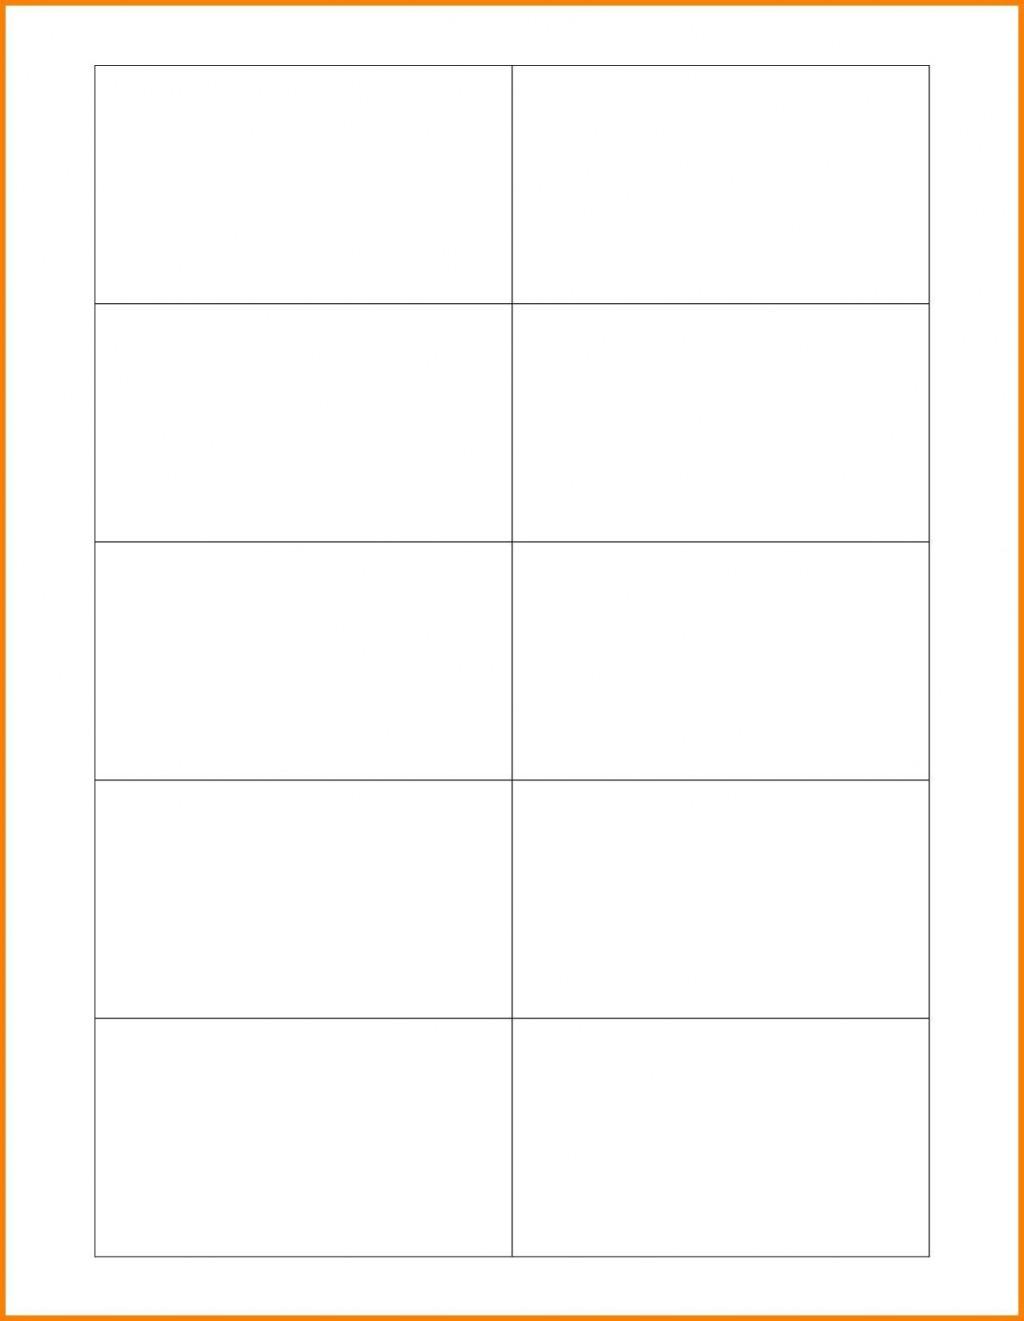 005 Impressive Free Printable Busines Card Template For Word Sample  BlankLarge